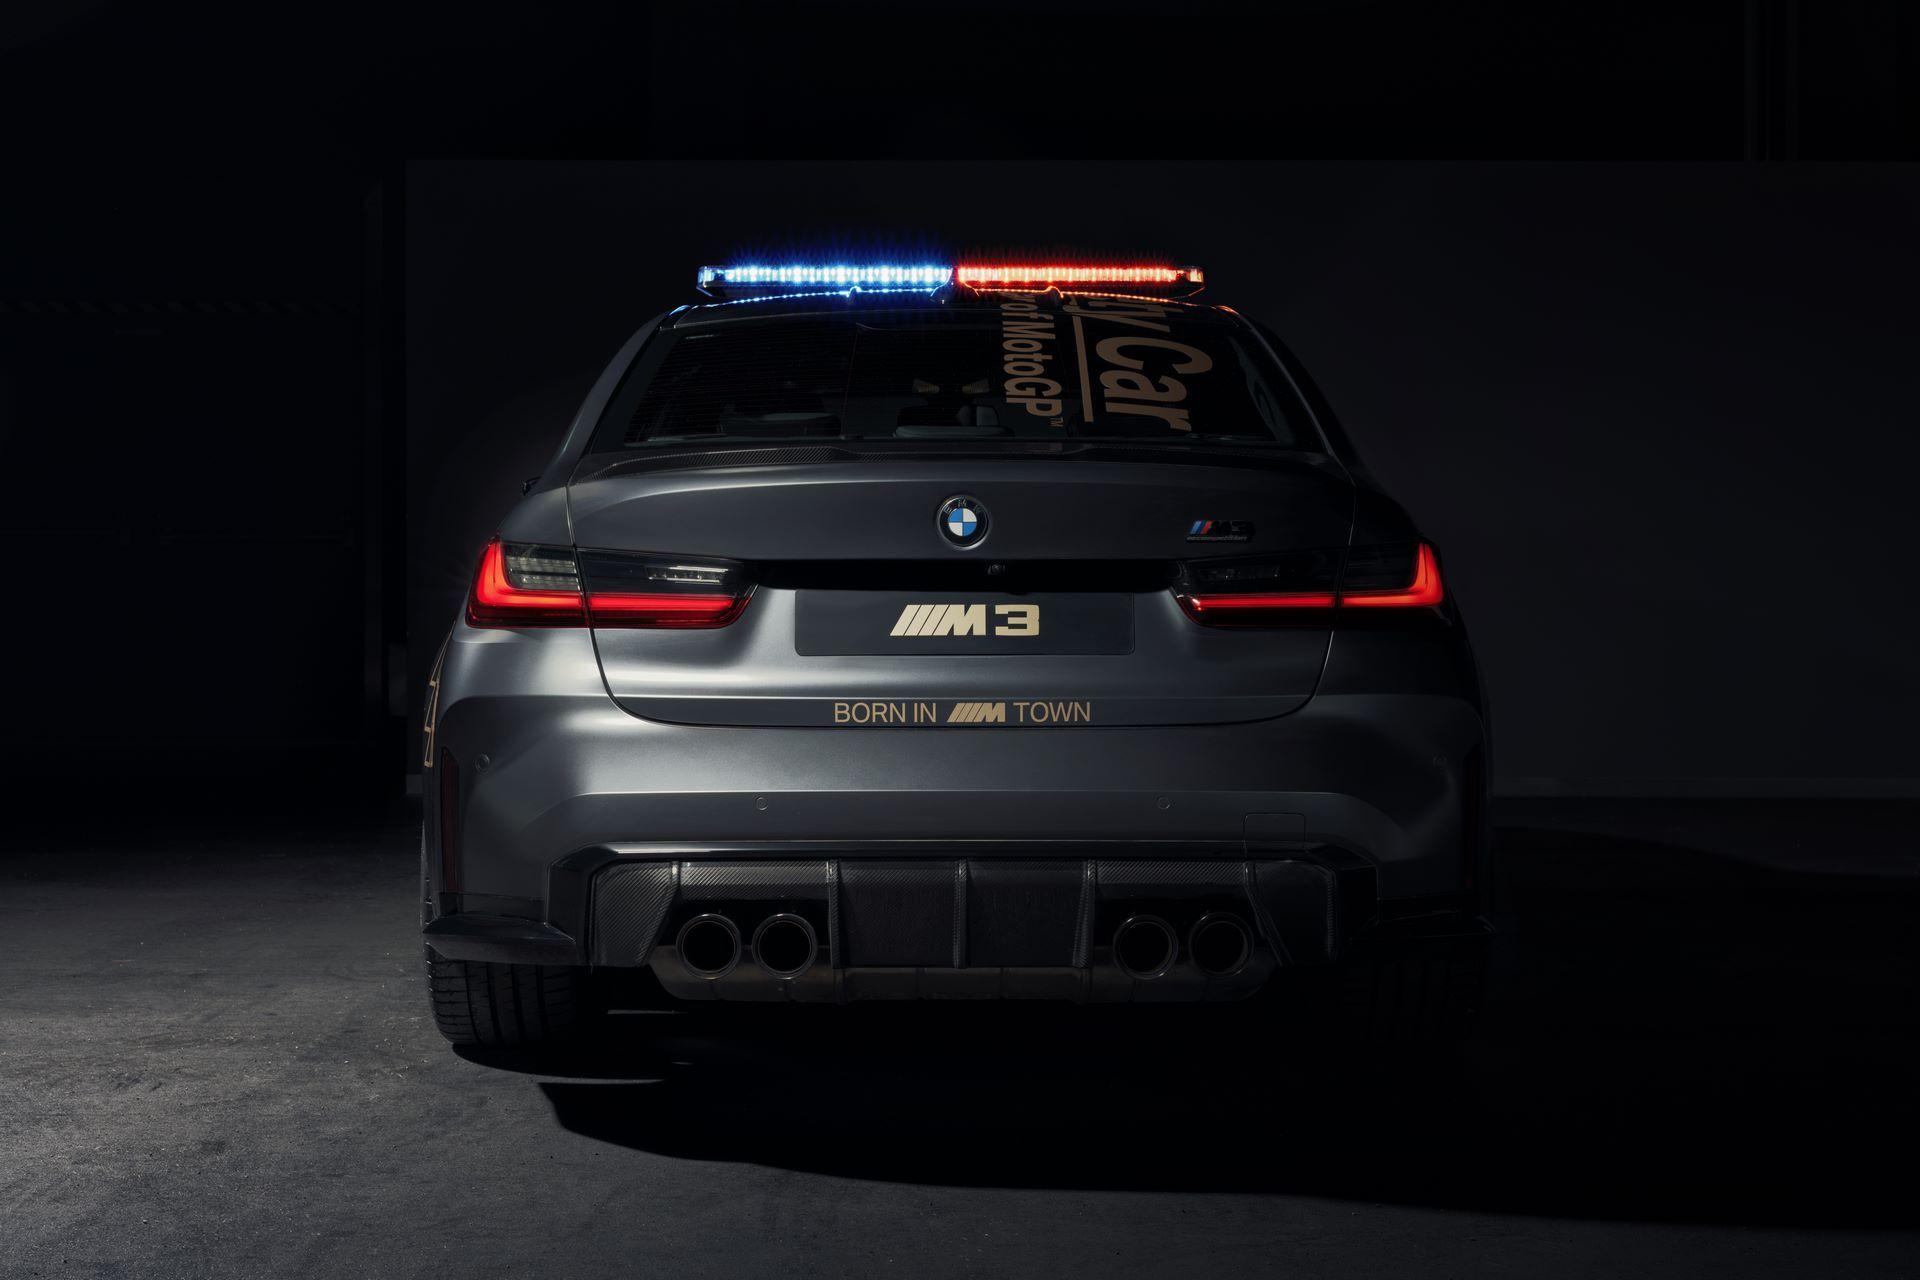 BMW-M3-M4-M5-CS-Safety-Cars-moto-gp-motogp-5